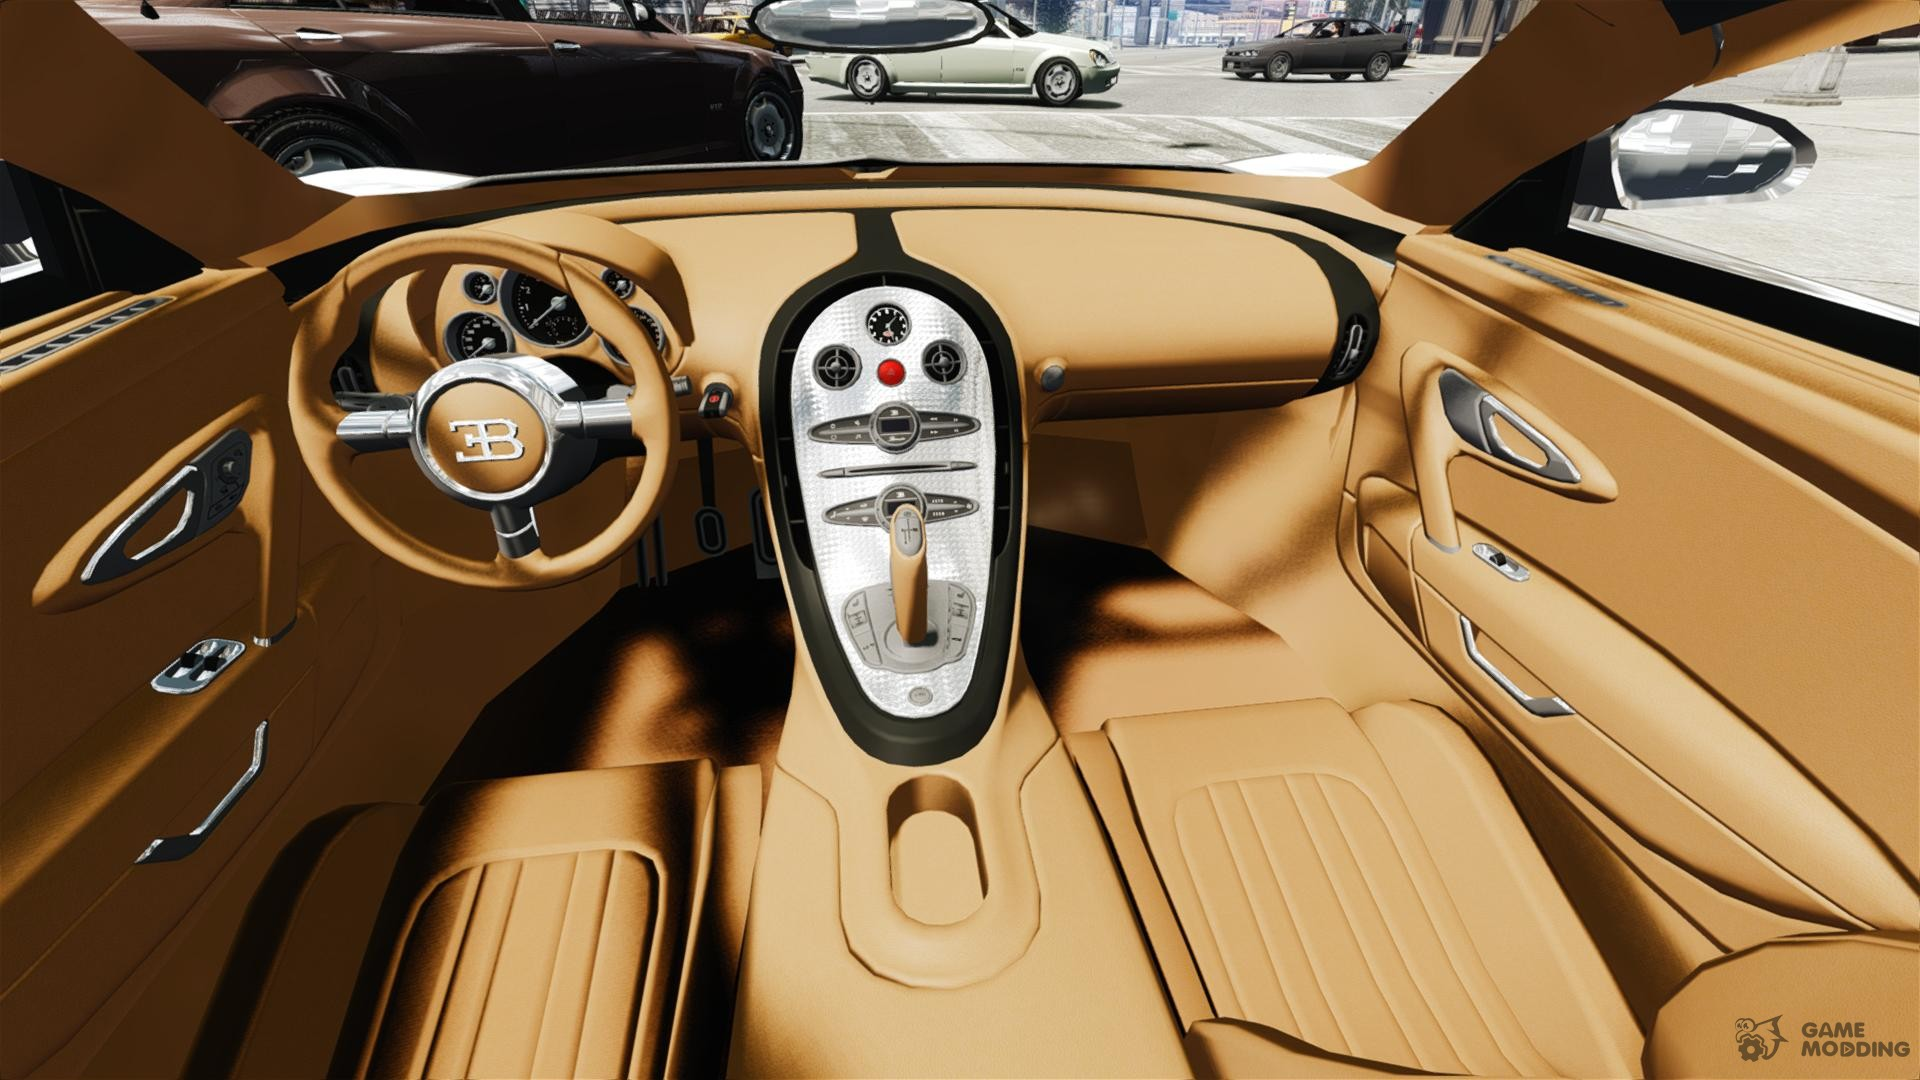 94c618f03aaeaa61660c22d483214cb4e7781d7d3917bc73a86a43e6bcac1d6b Wonderful Bugatti Veyron Xbox 360 Games Cars Trend